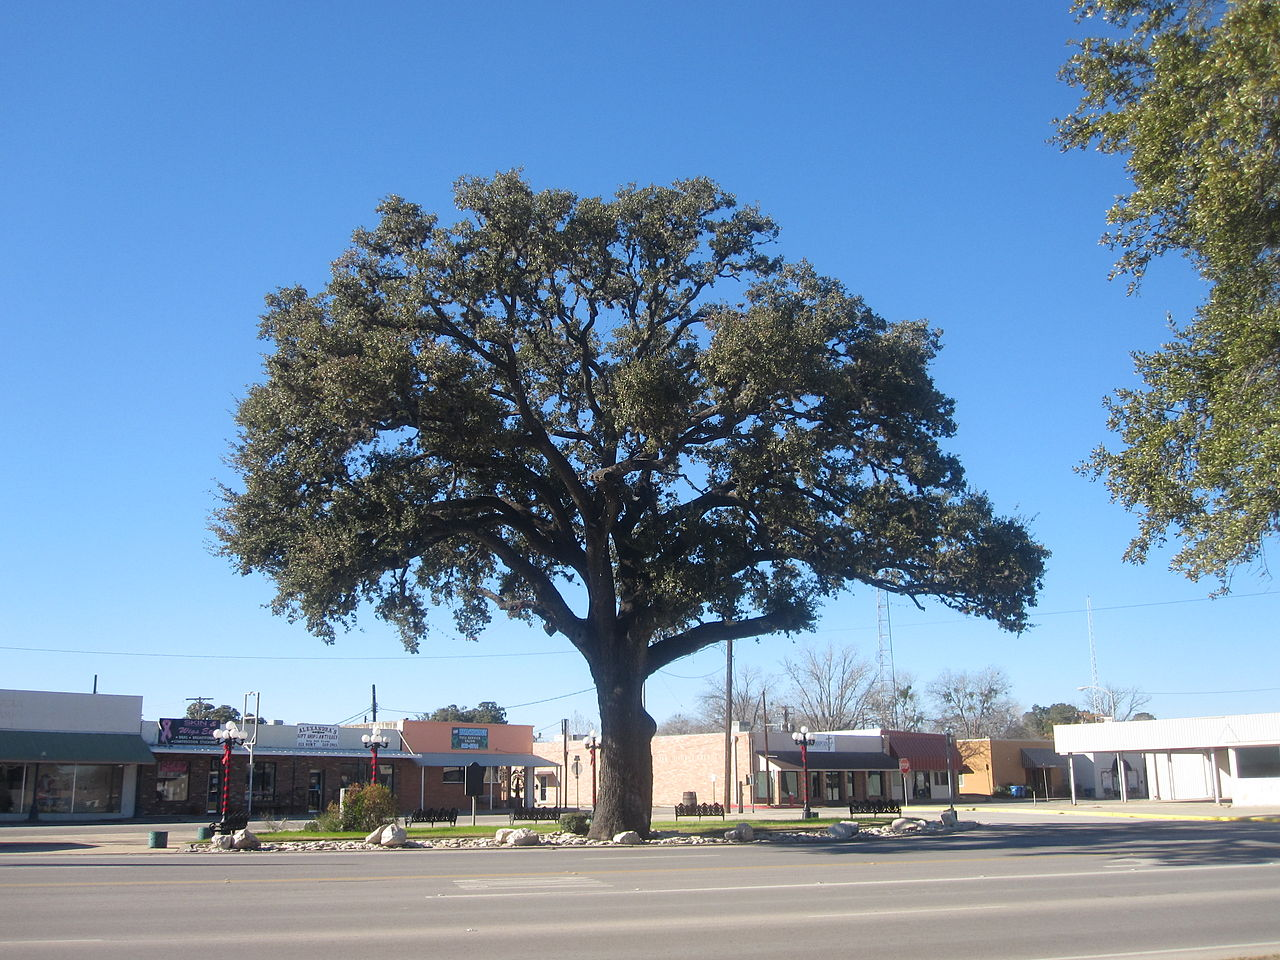 1280px-oak_tree_in_pleasanton_tx_img_2618